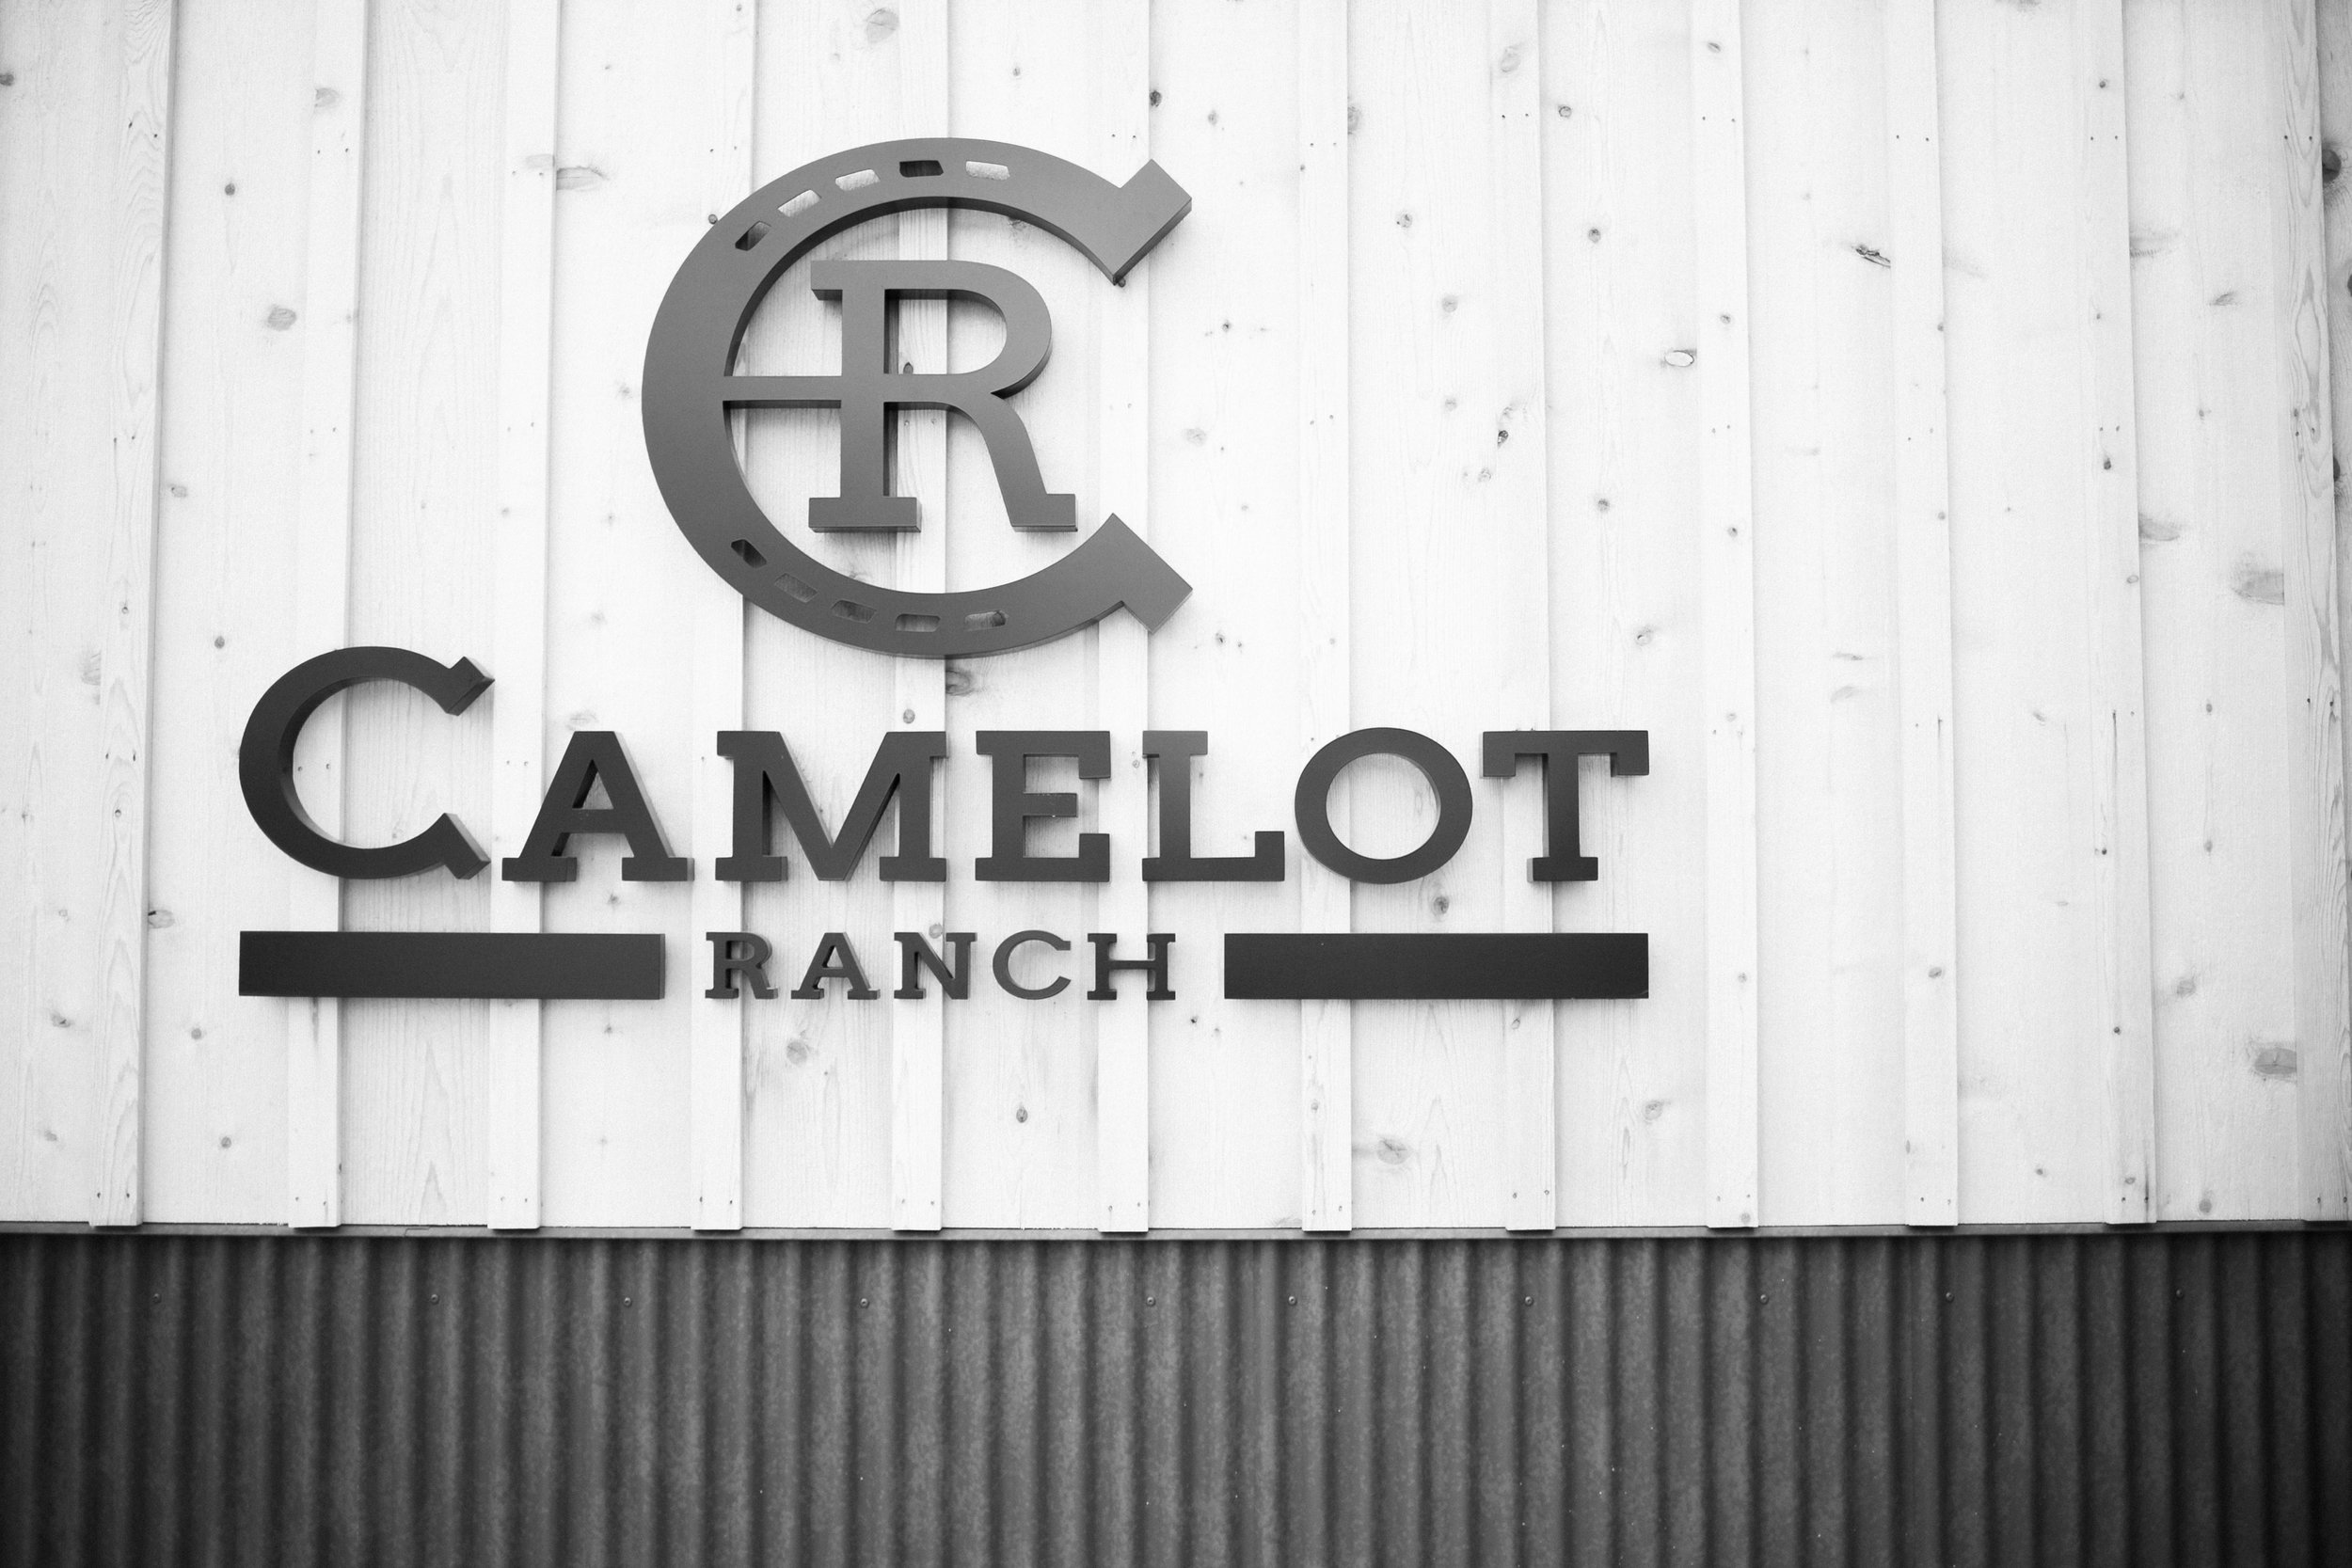 Wedding Venue, Camelot Ranch, Billings Mt.